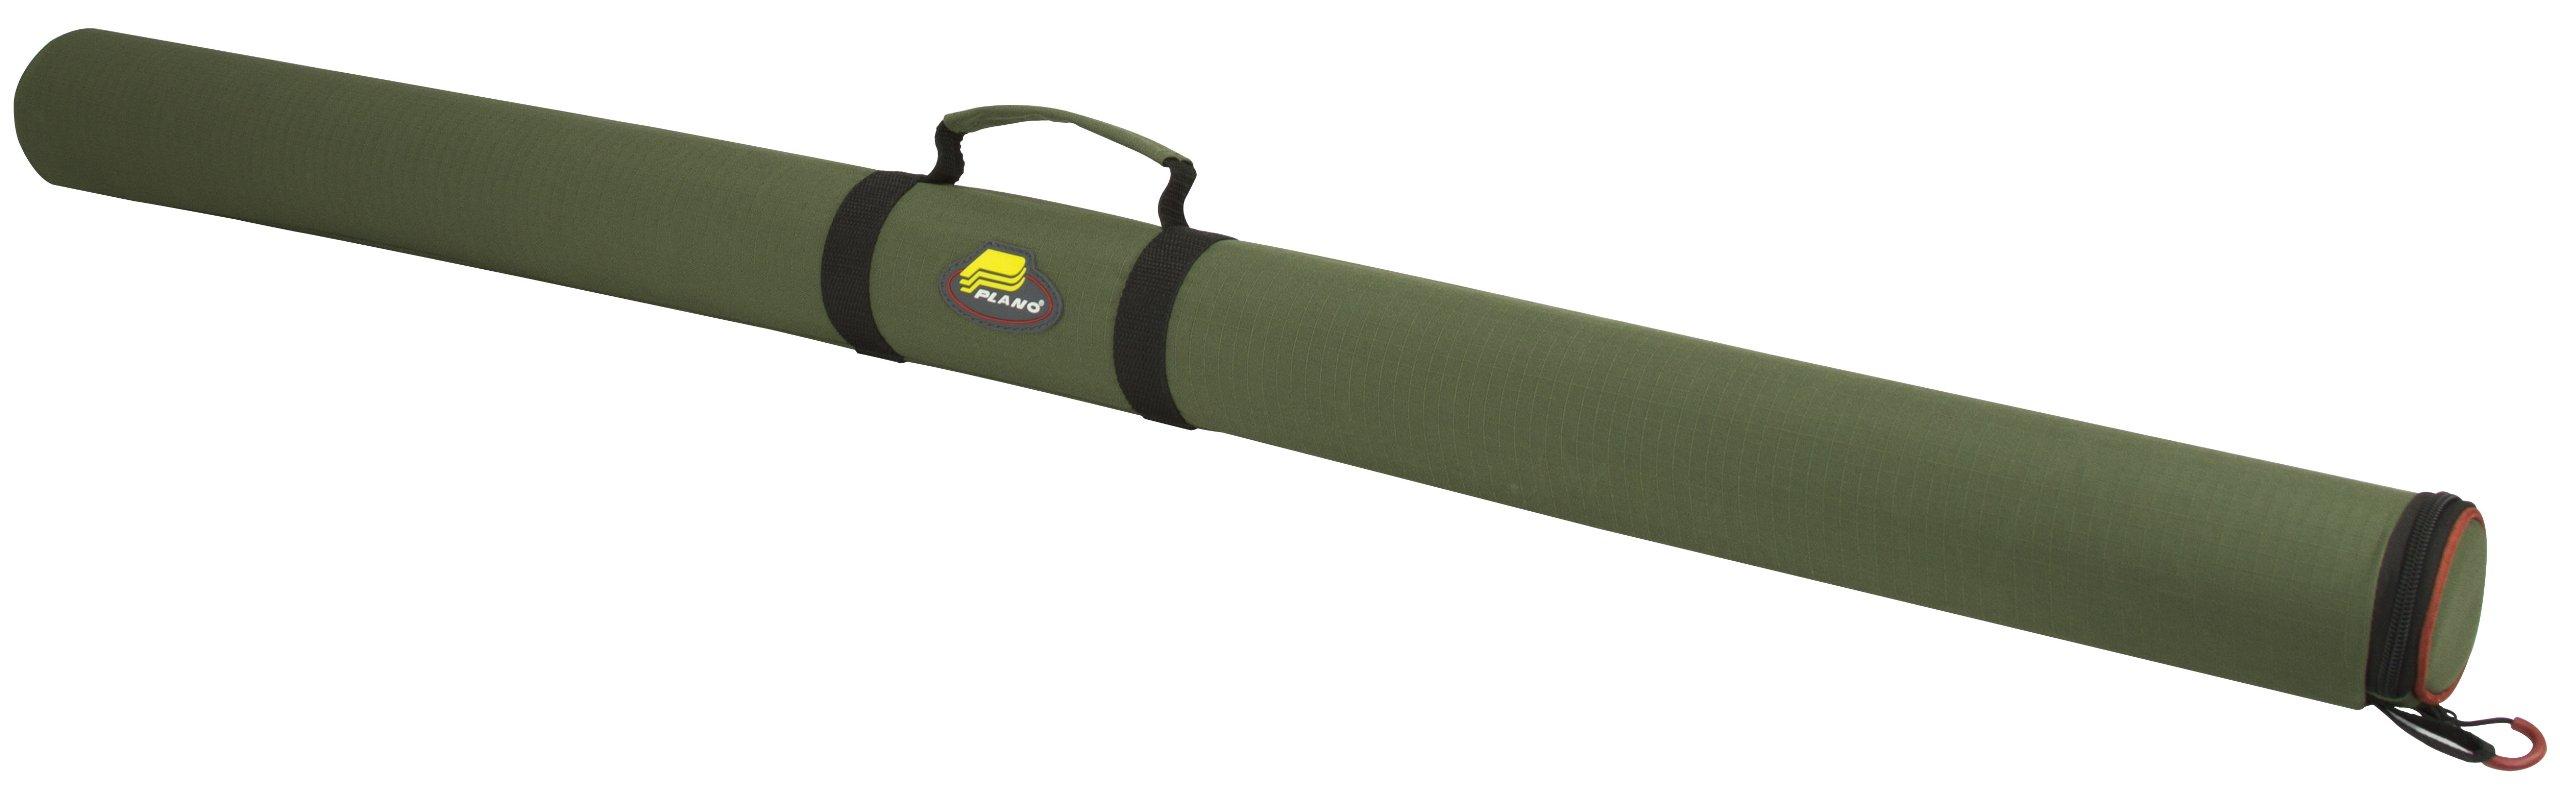 Plano 4448 Fabric Rod Tube, Green, 48-Inch